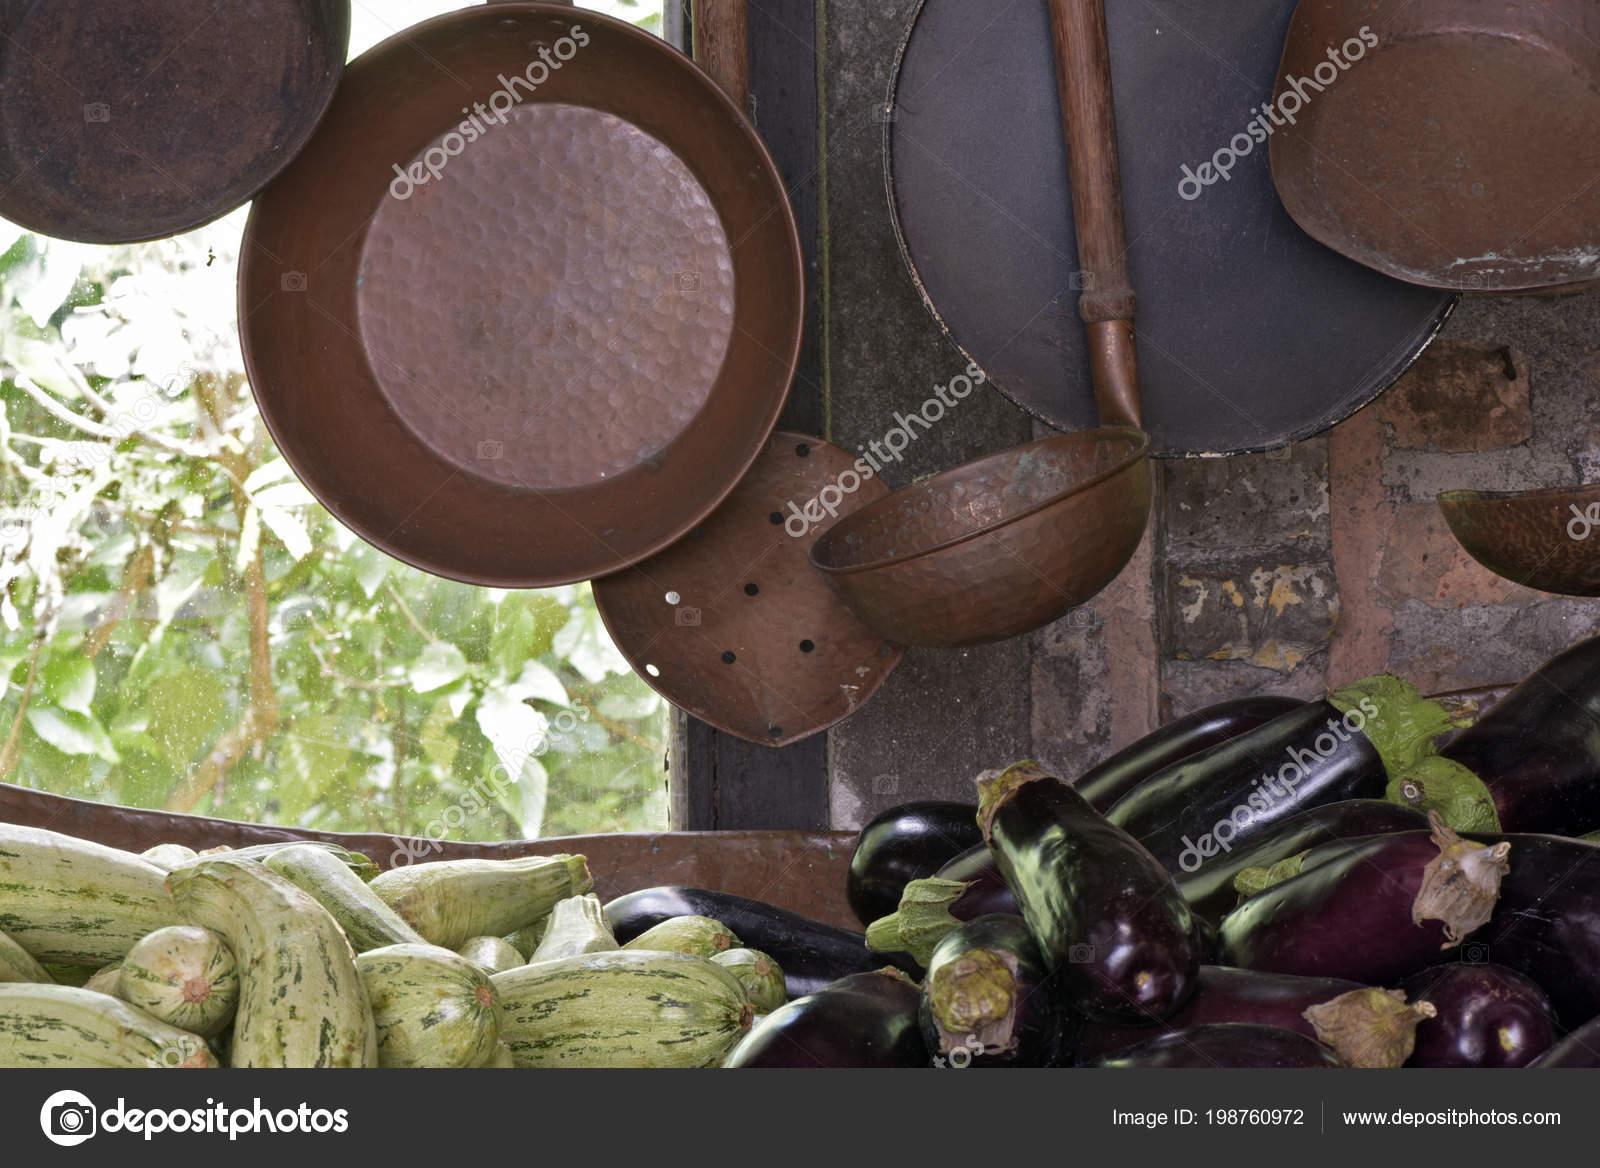 copper kitchen accents grey shaker cabinets 铜和铁壶和平底锅作为厨房装饰元素和茶水间 图库照片 c jaboticabafotos 图库